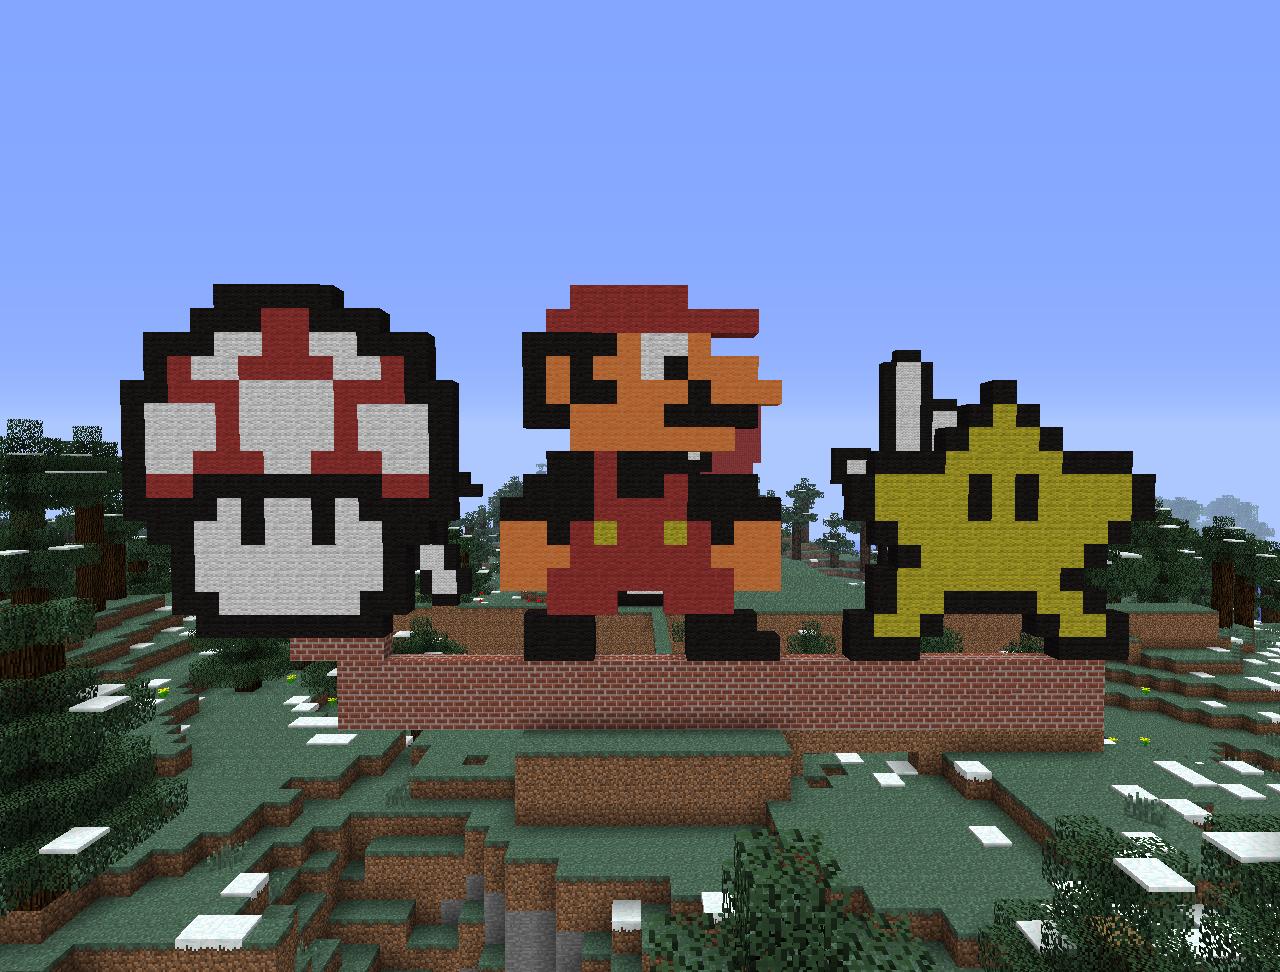 Minecraft Pixel Arts Minu Tehtud Minecraft Pixel Art